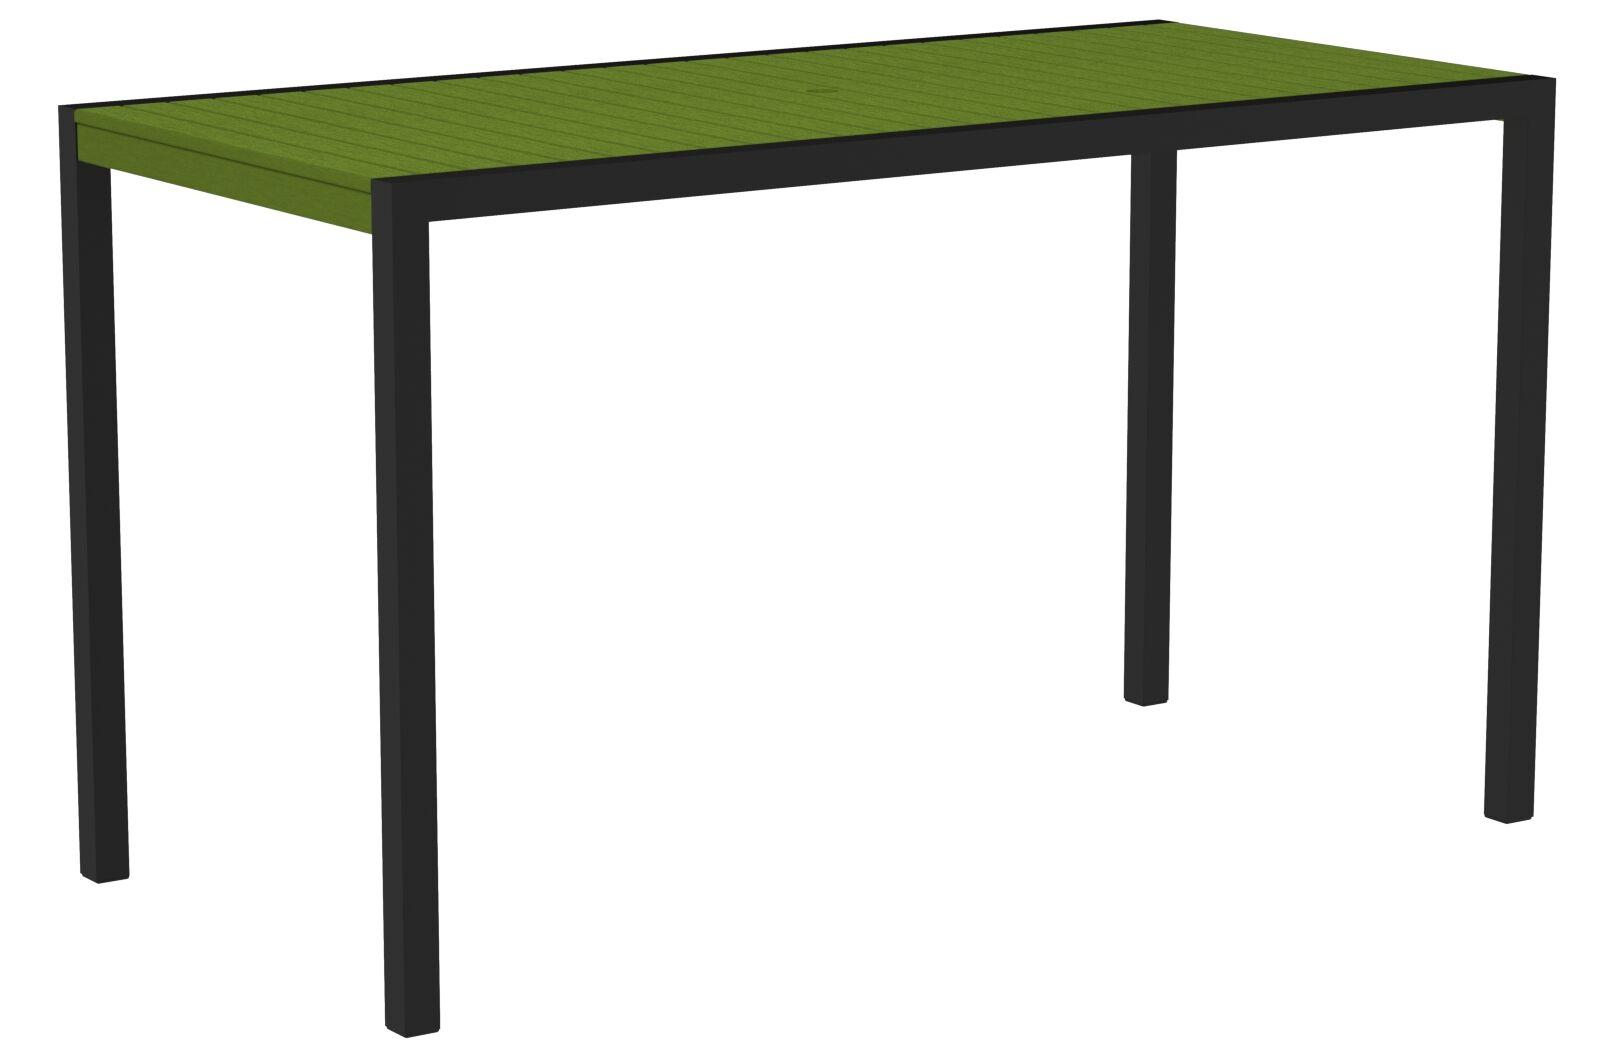 Mod Bar Table Top Finish: Lime, Base Finish: Textured Black